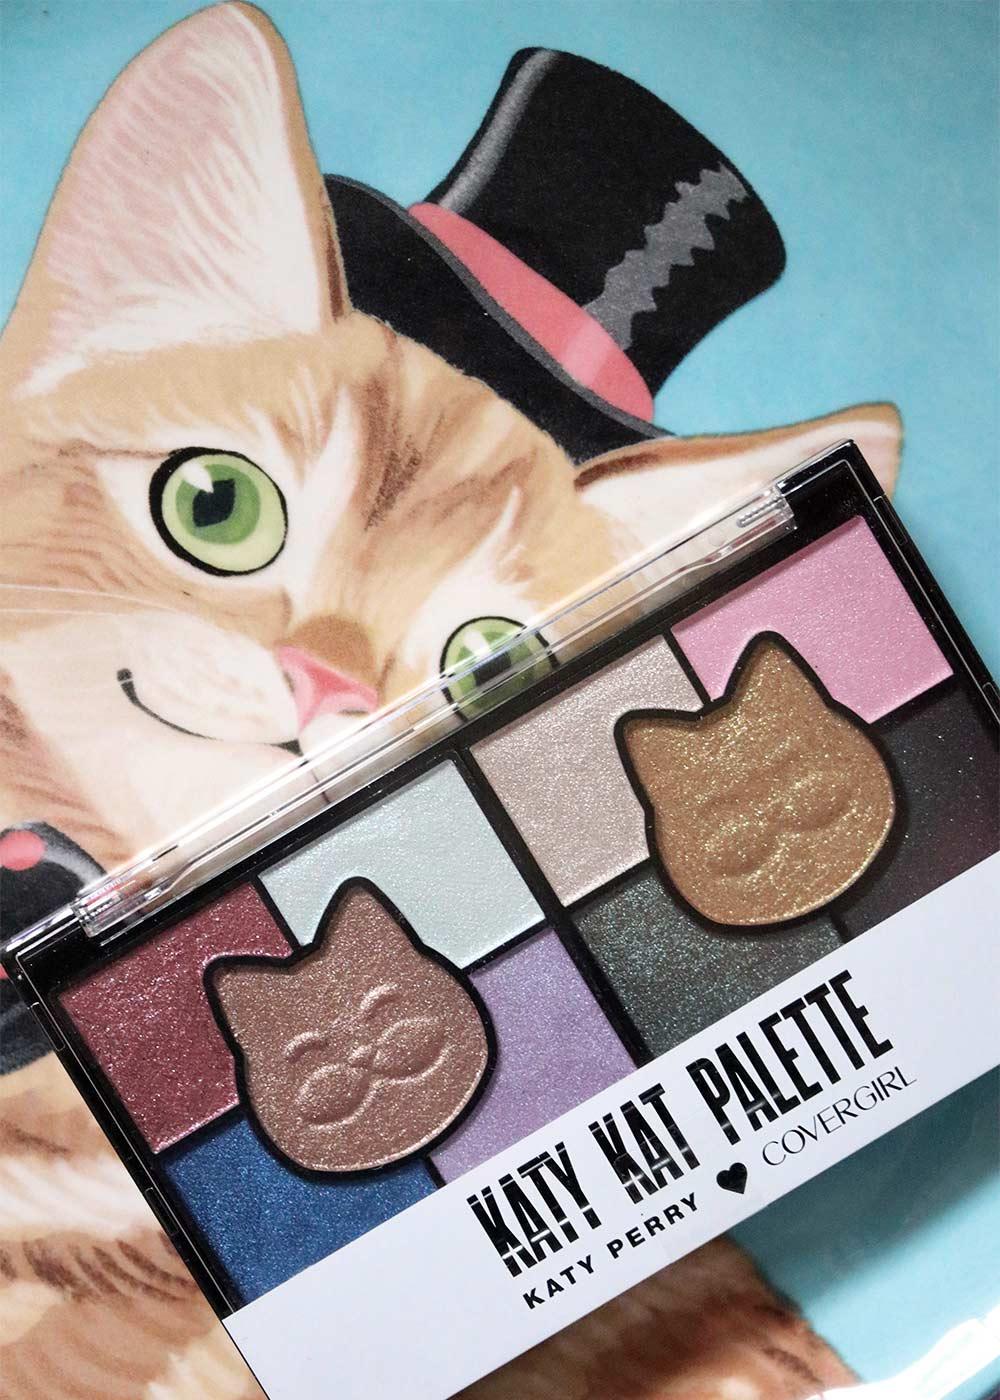 katy kat cool kat palette